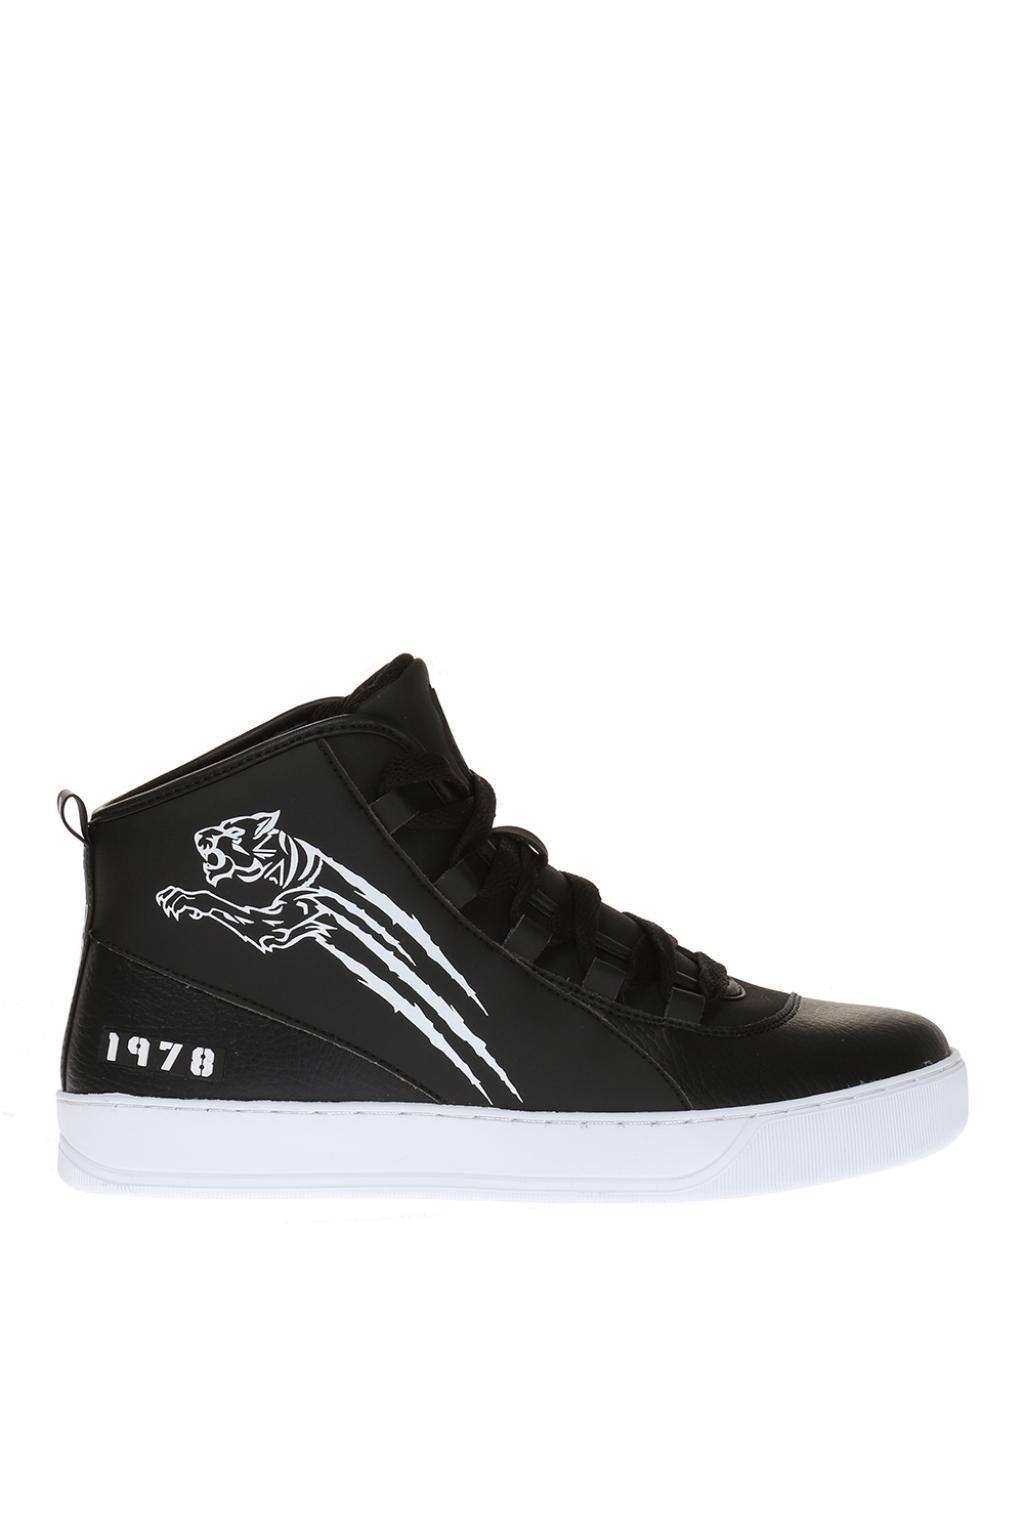 studded lace-up sneakers - Metallic Plein Sport kQ8m85w